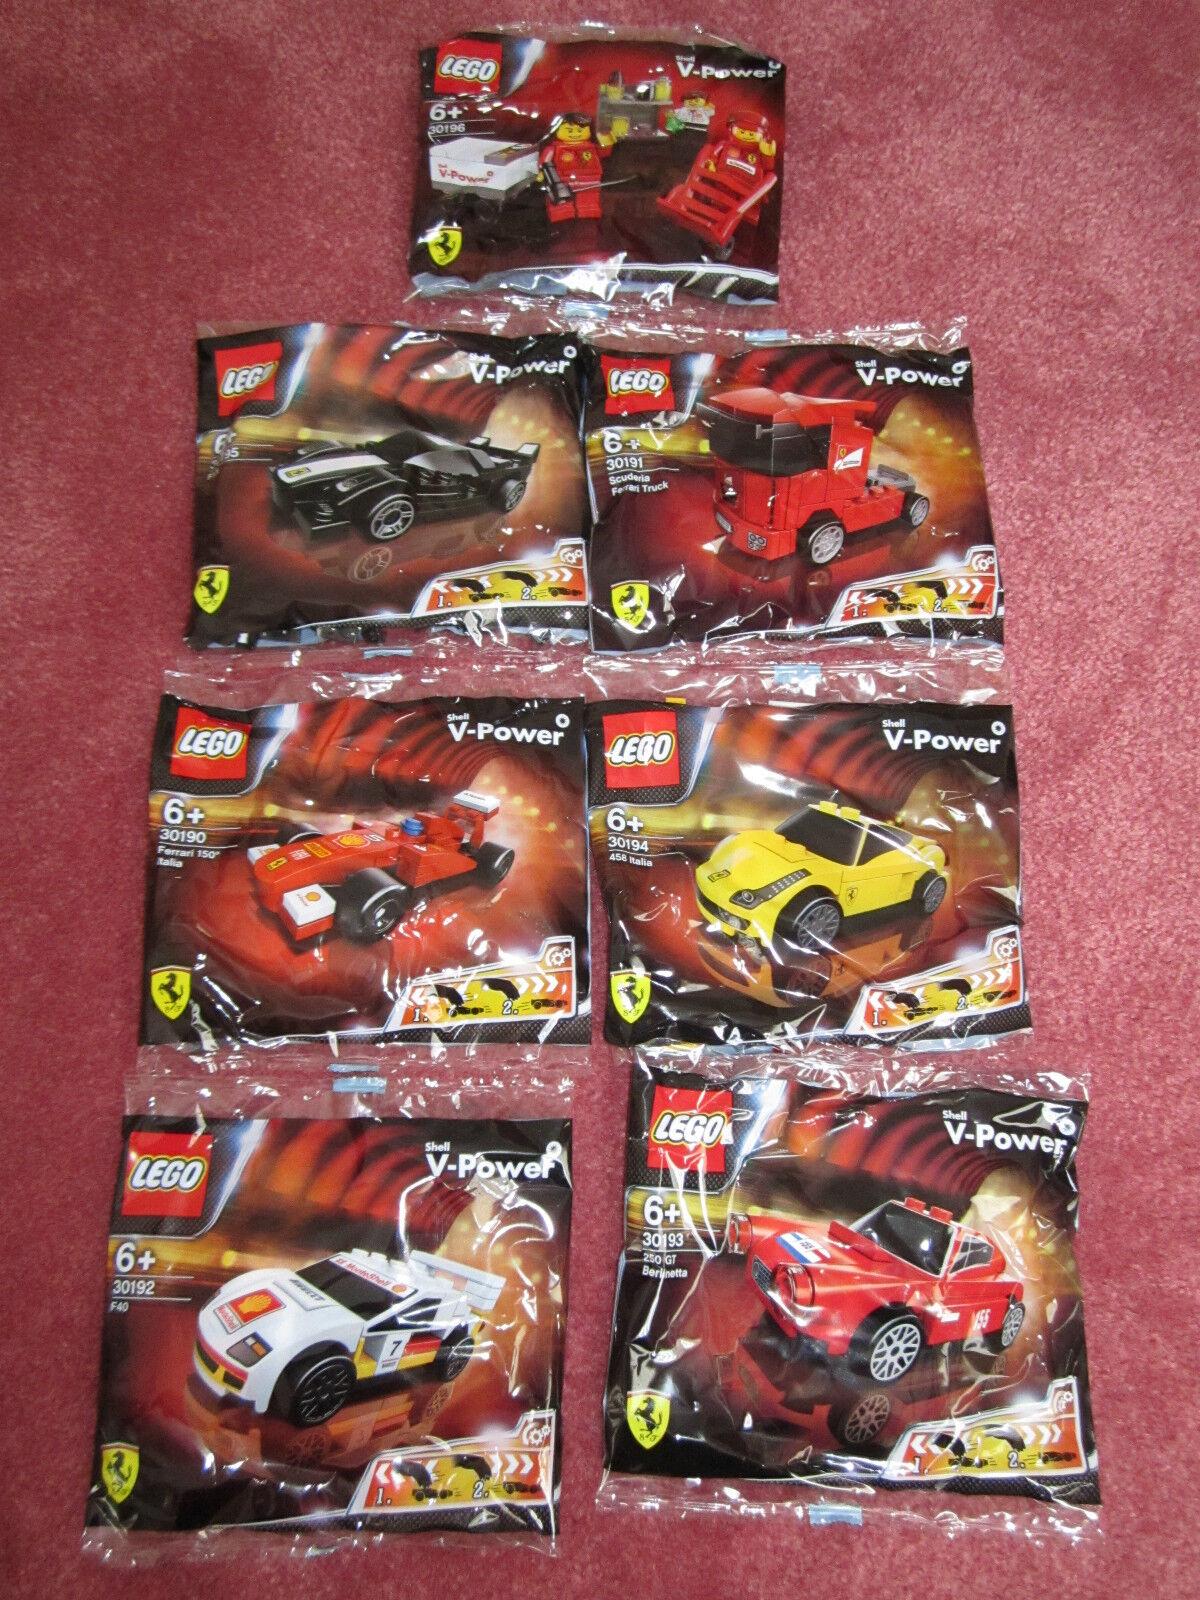 LEGO FERRARI SHELL V POWER PIT CREW & FERRARI CARS 30196 & 30195 - NEW SEALED